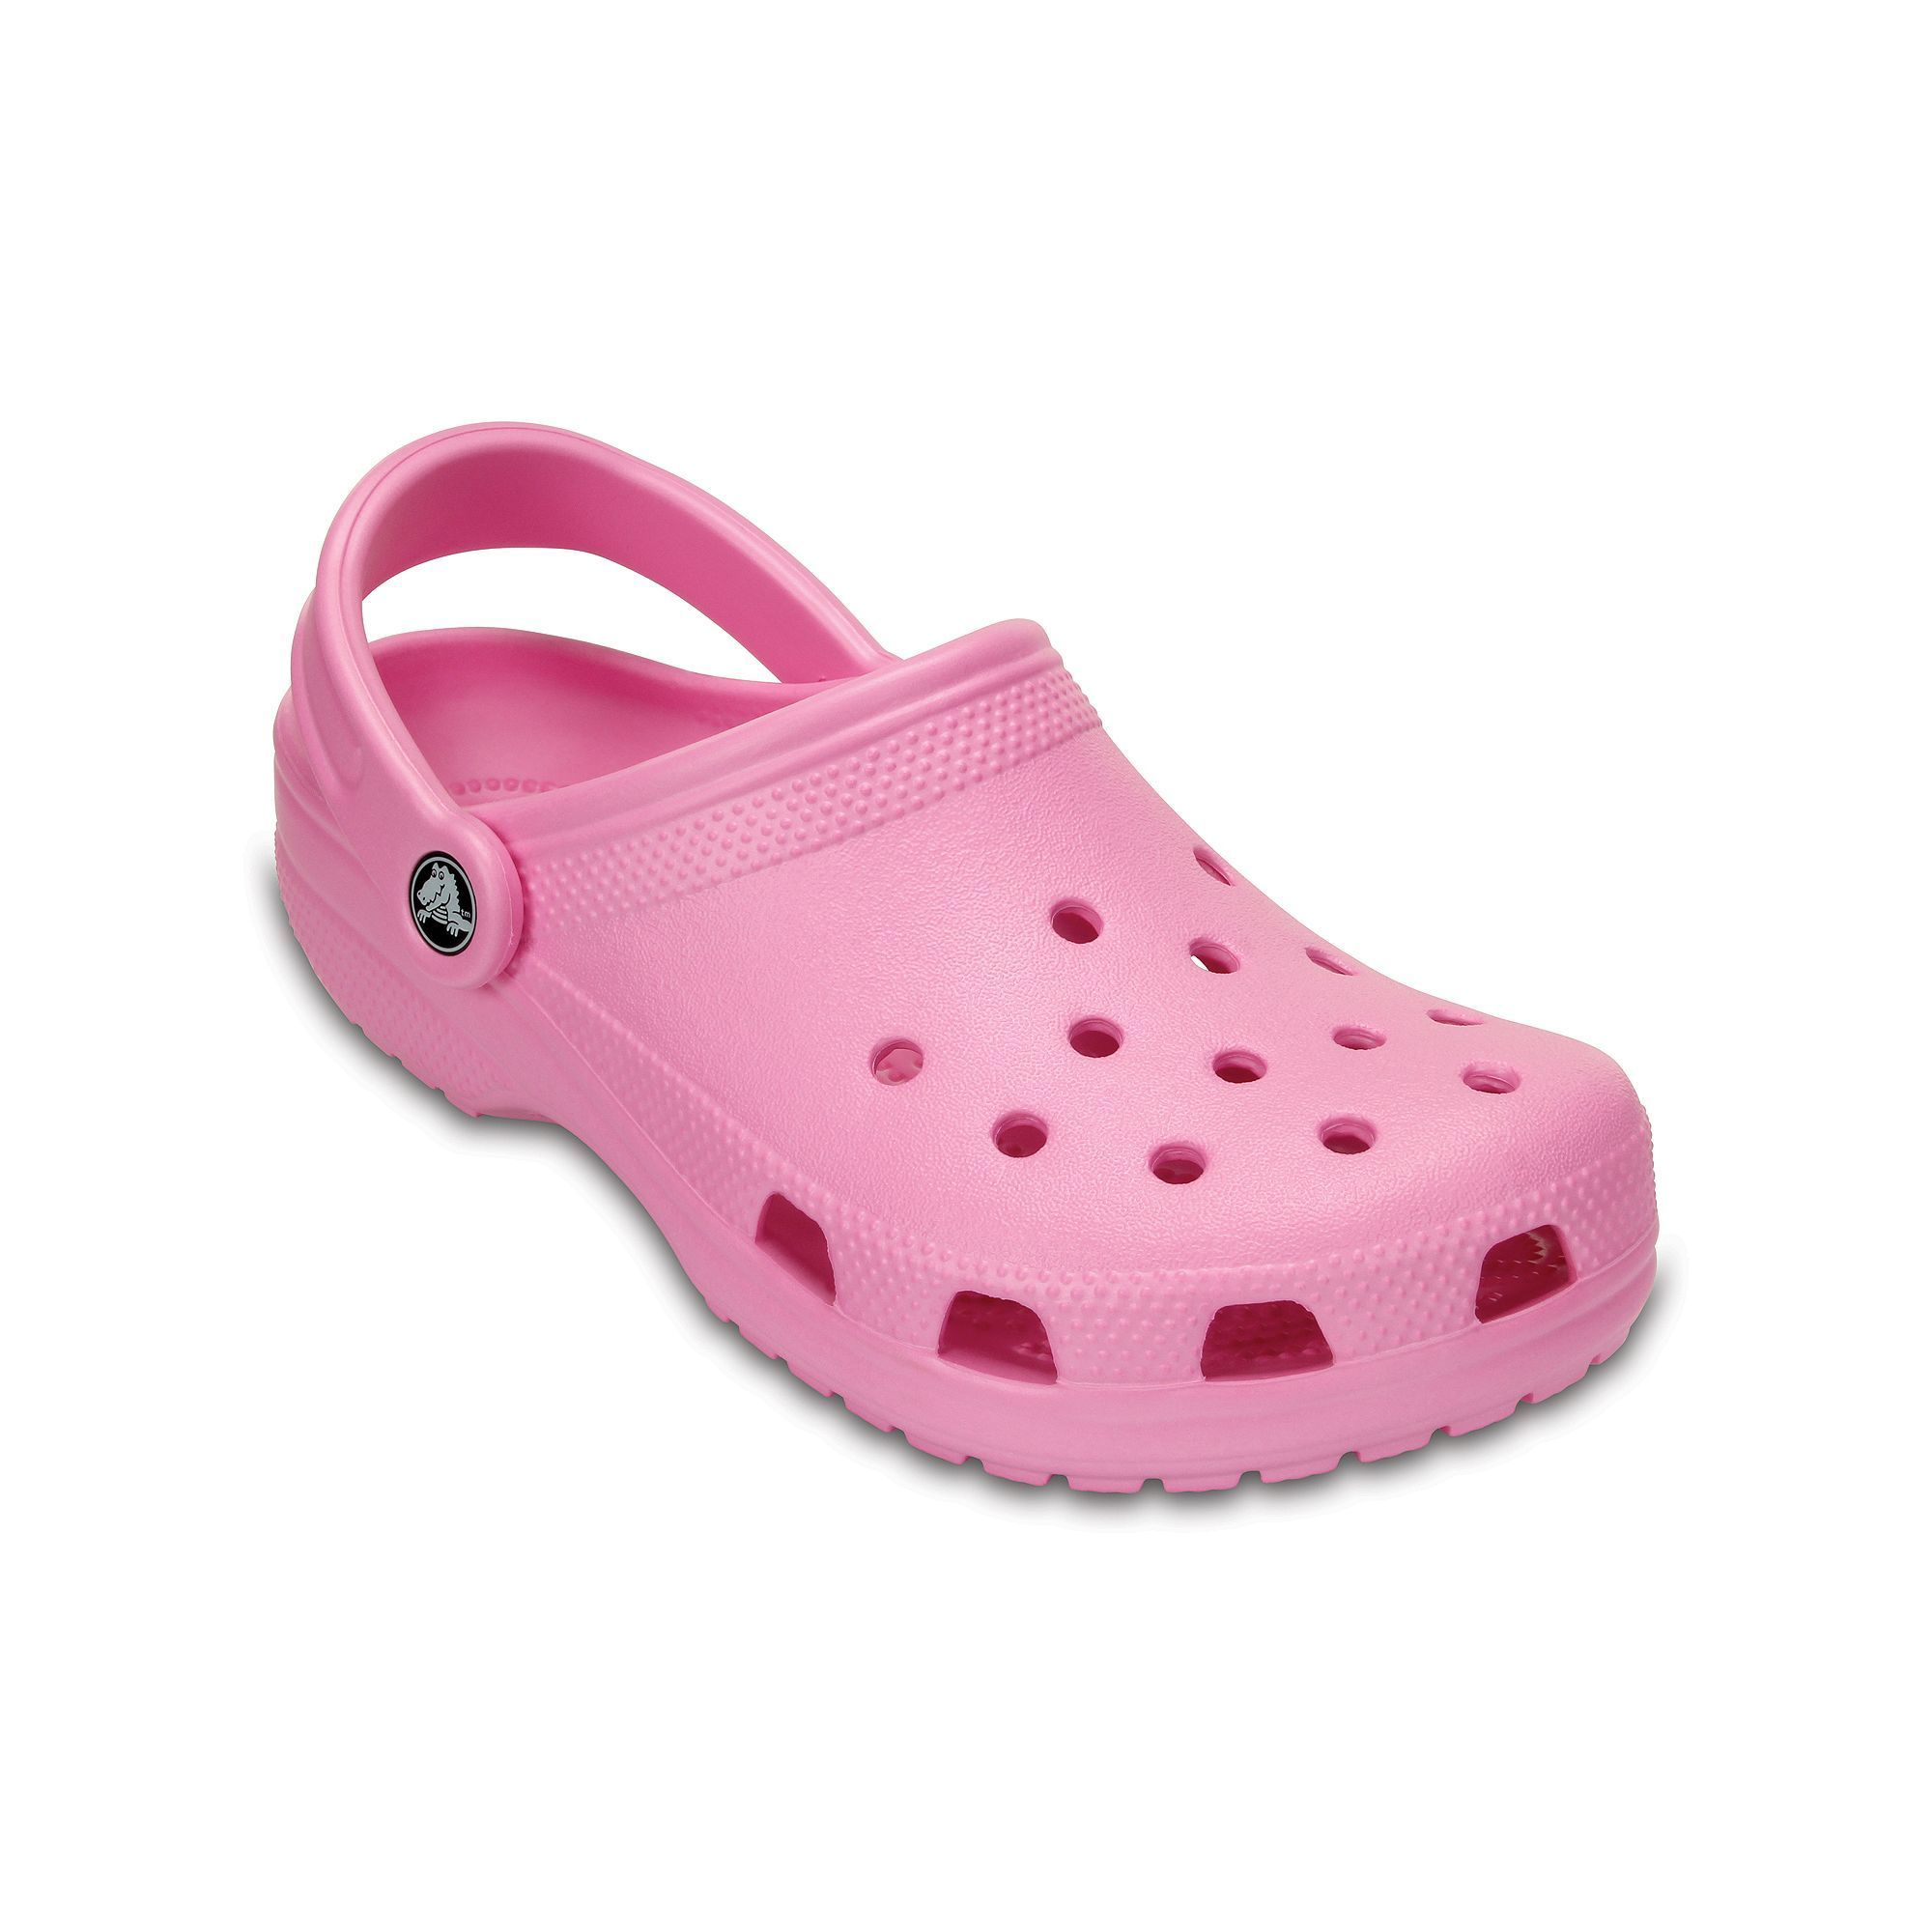 Crocs Classic Adult Clogs 100% authentic cheap price qrTjW4tqN